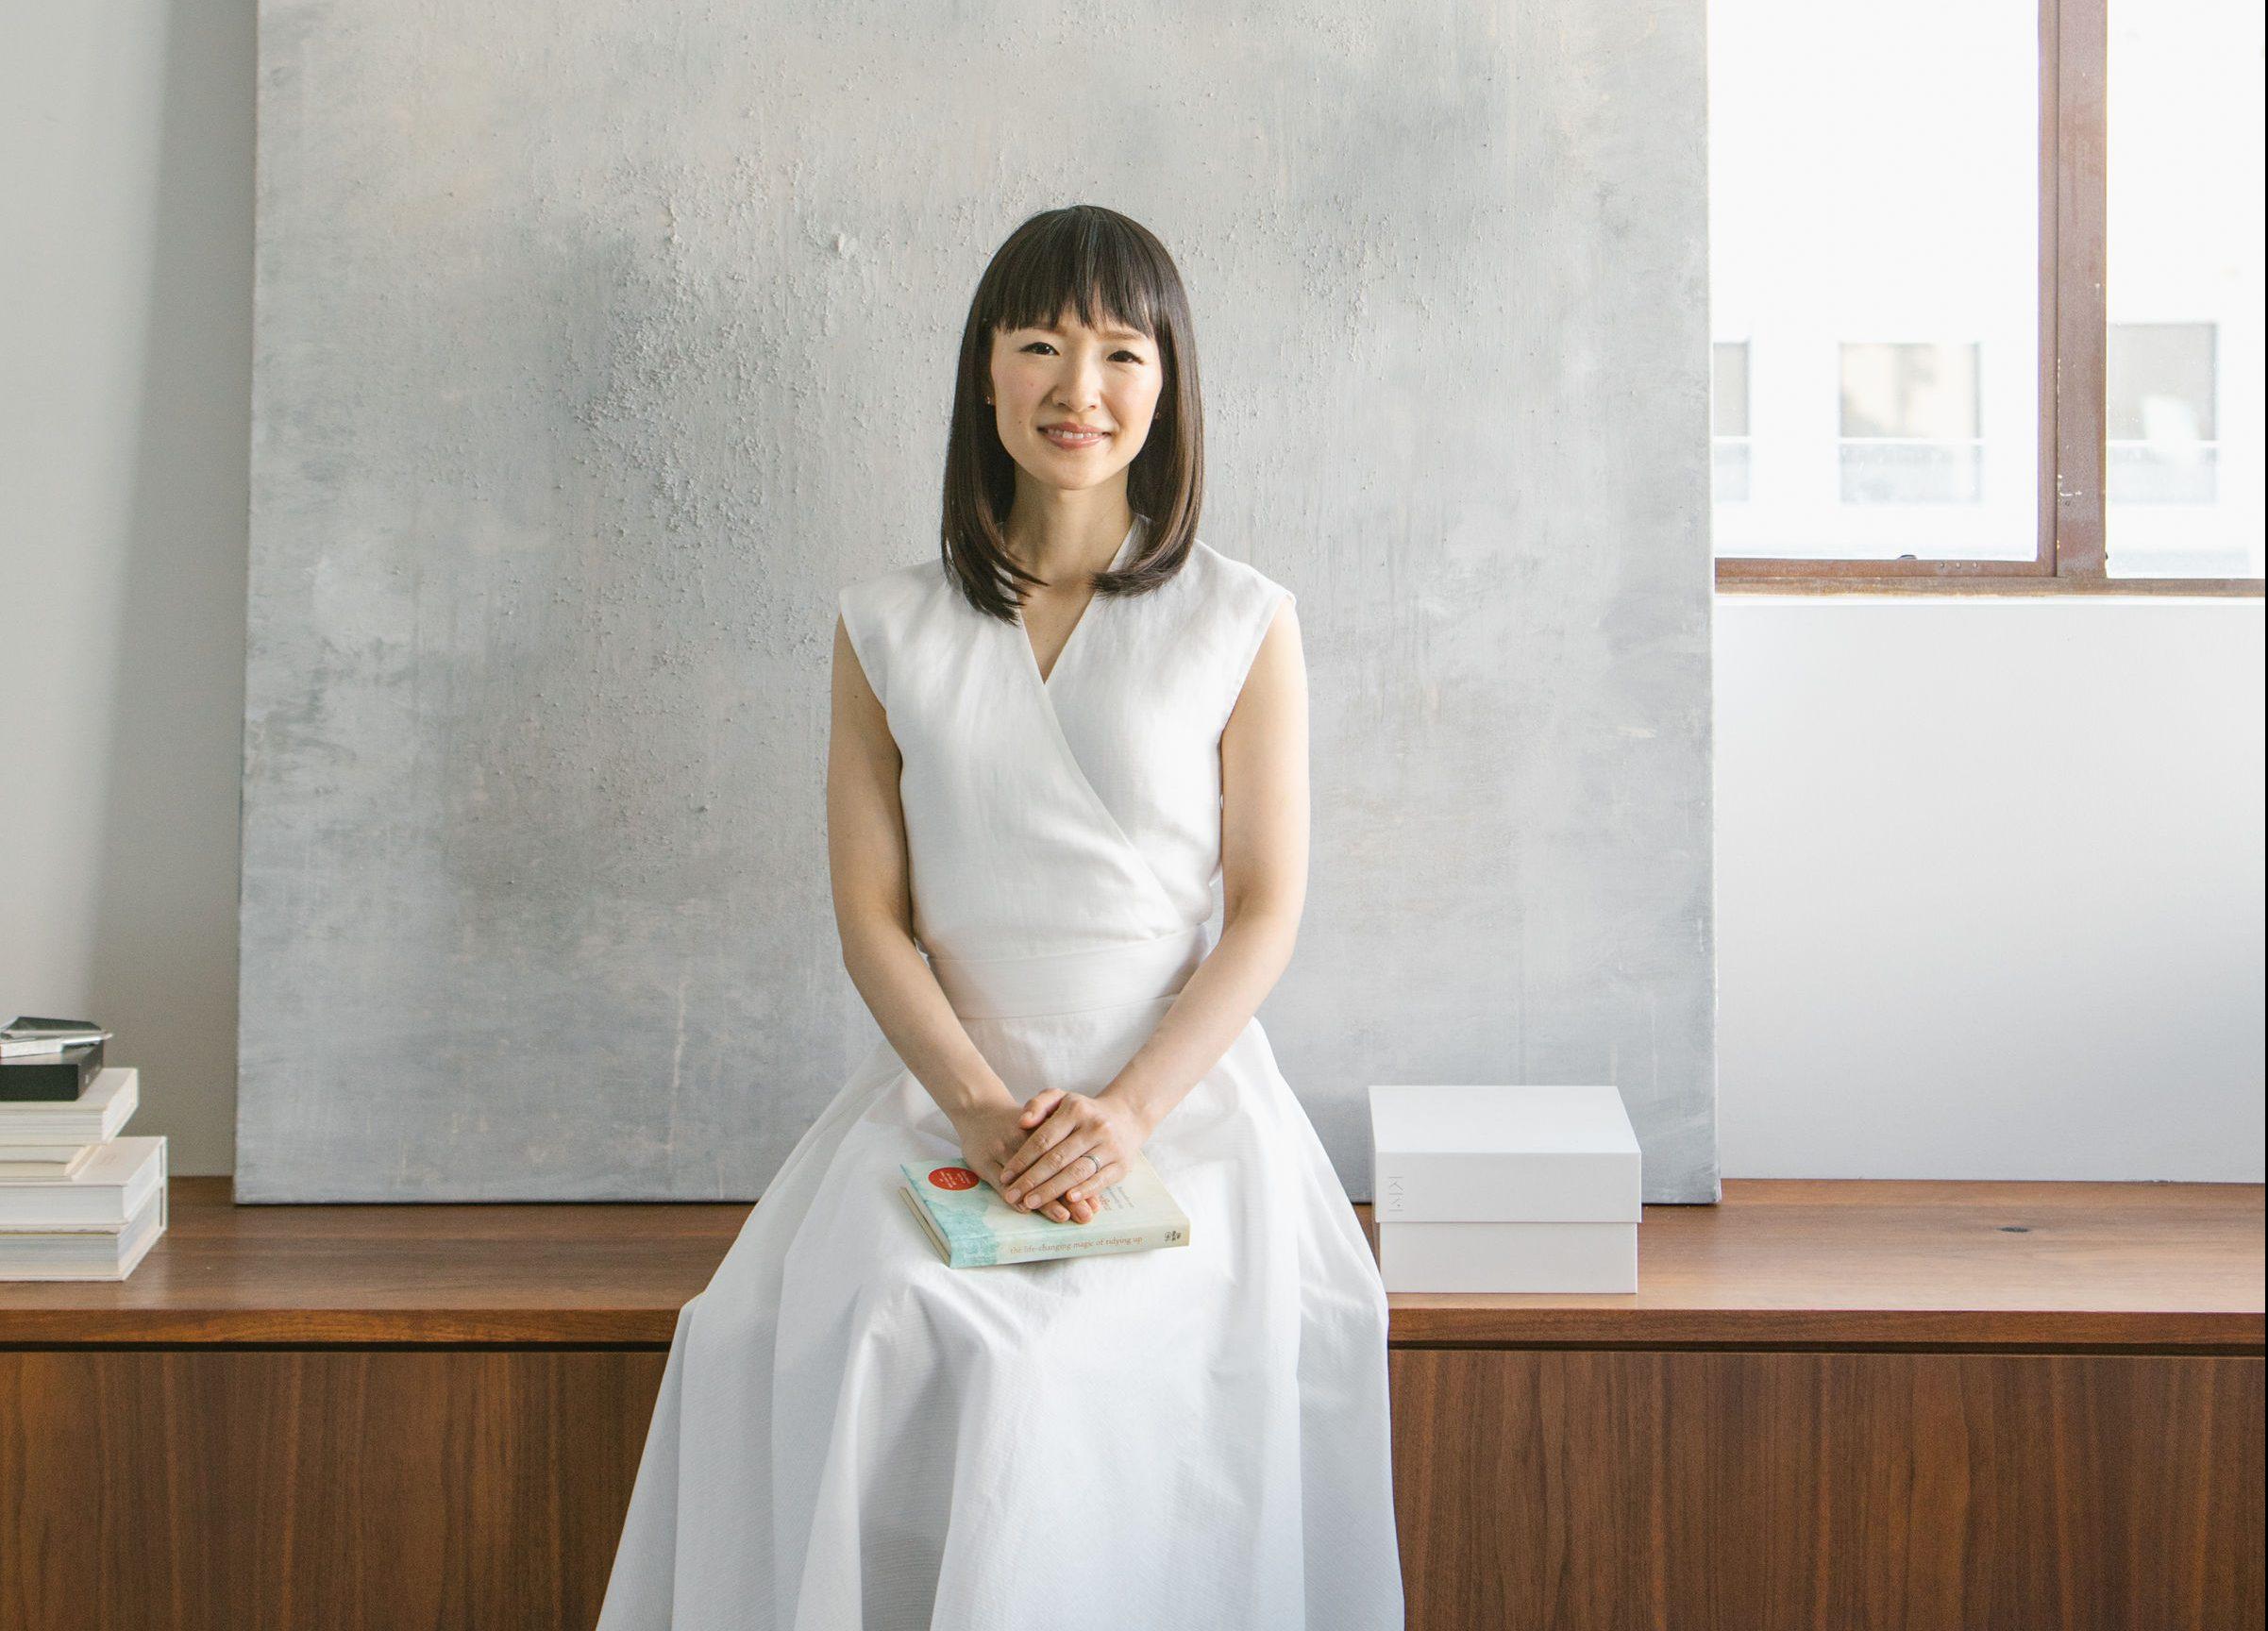 Rakuten is sparking joy with a new partnership with Marie Kondo and her company, KonMari Media, Inc.